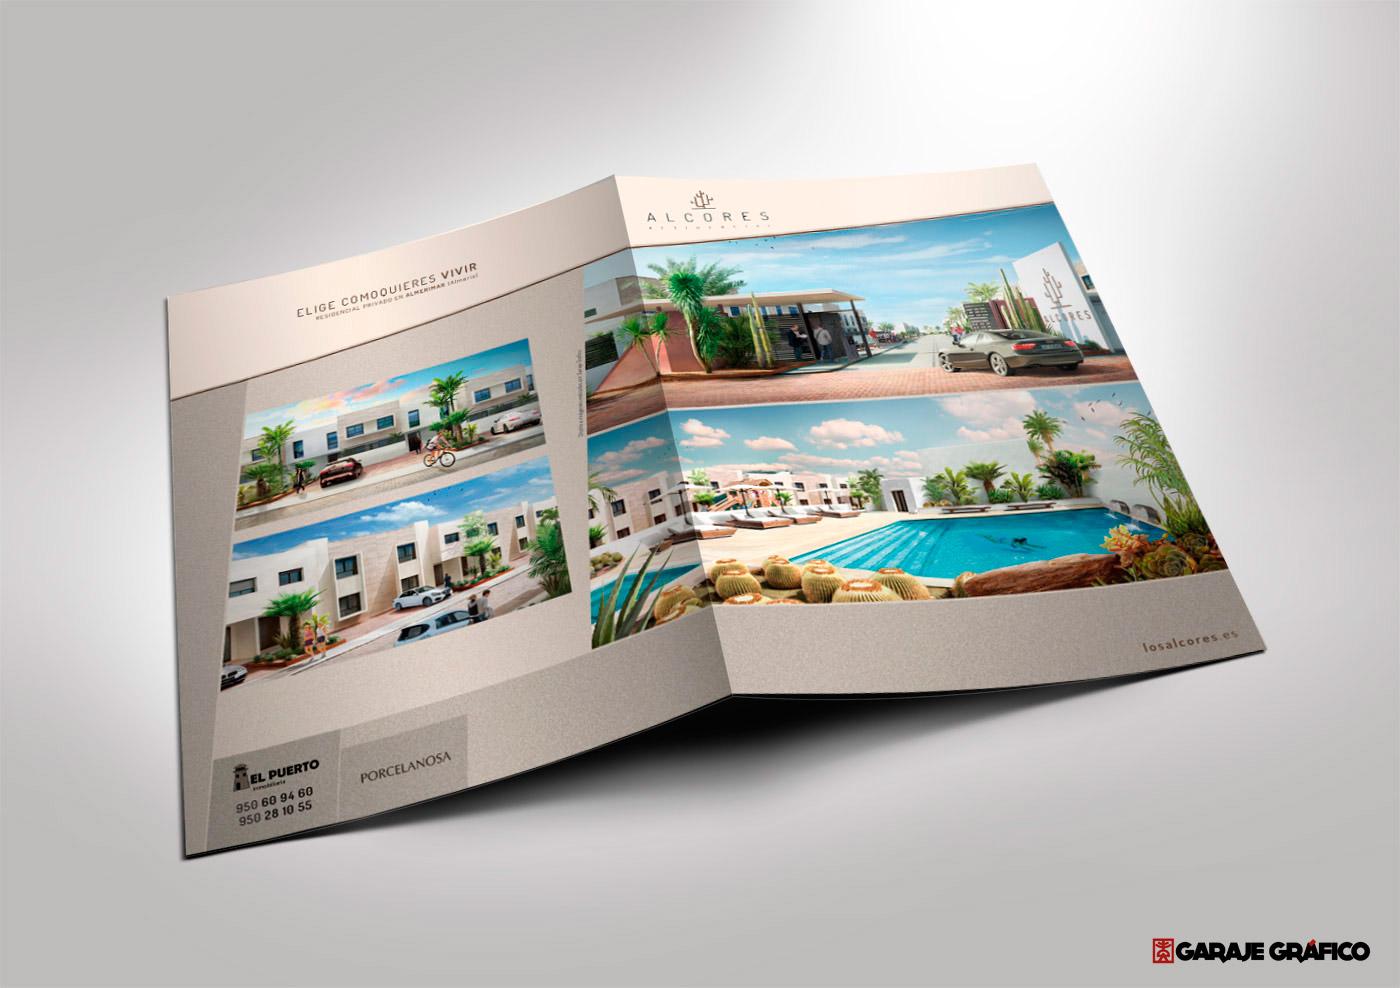 diseño de papeleria corporativa, carpetas, venta inmobiliaria, diseño para venta inmobiliaria, diseño grafico almeria